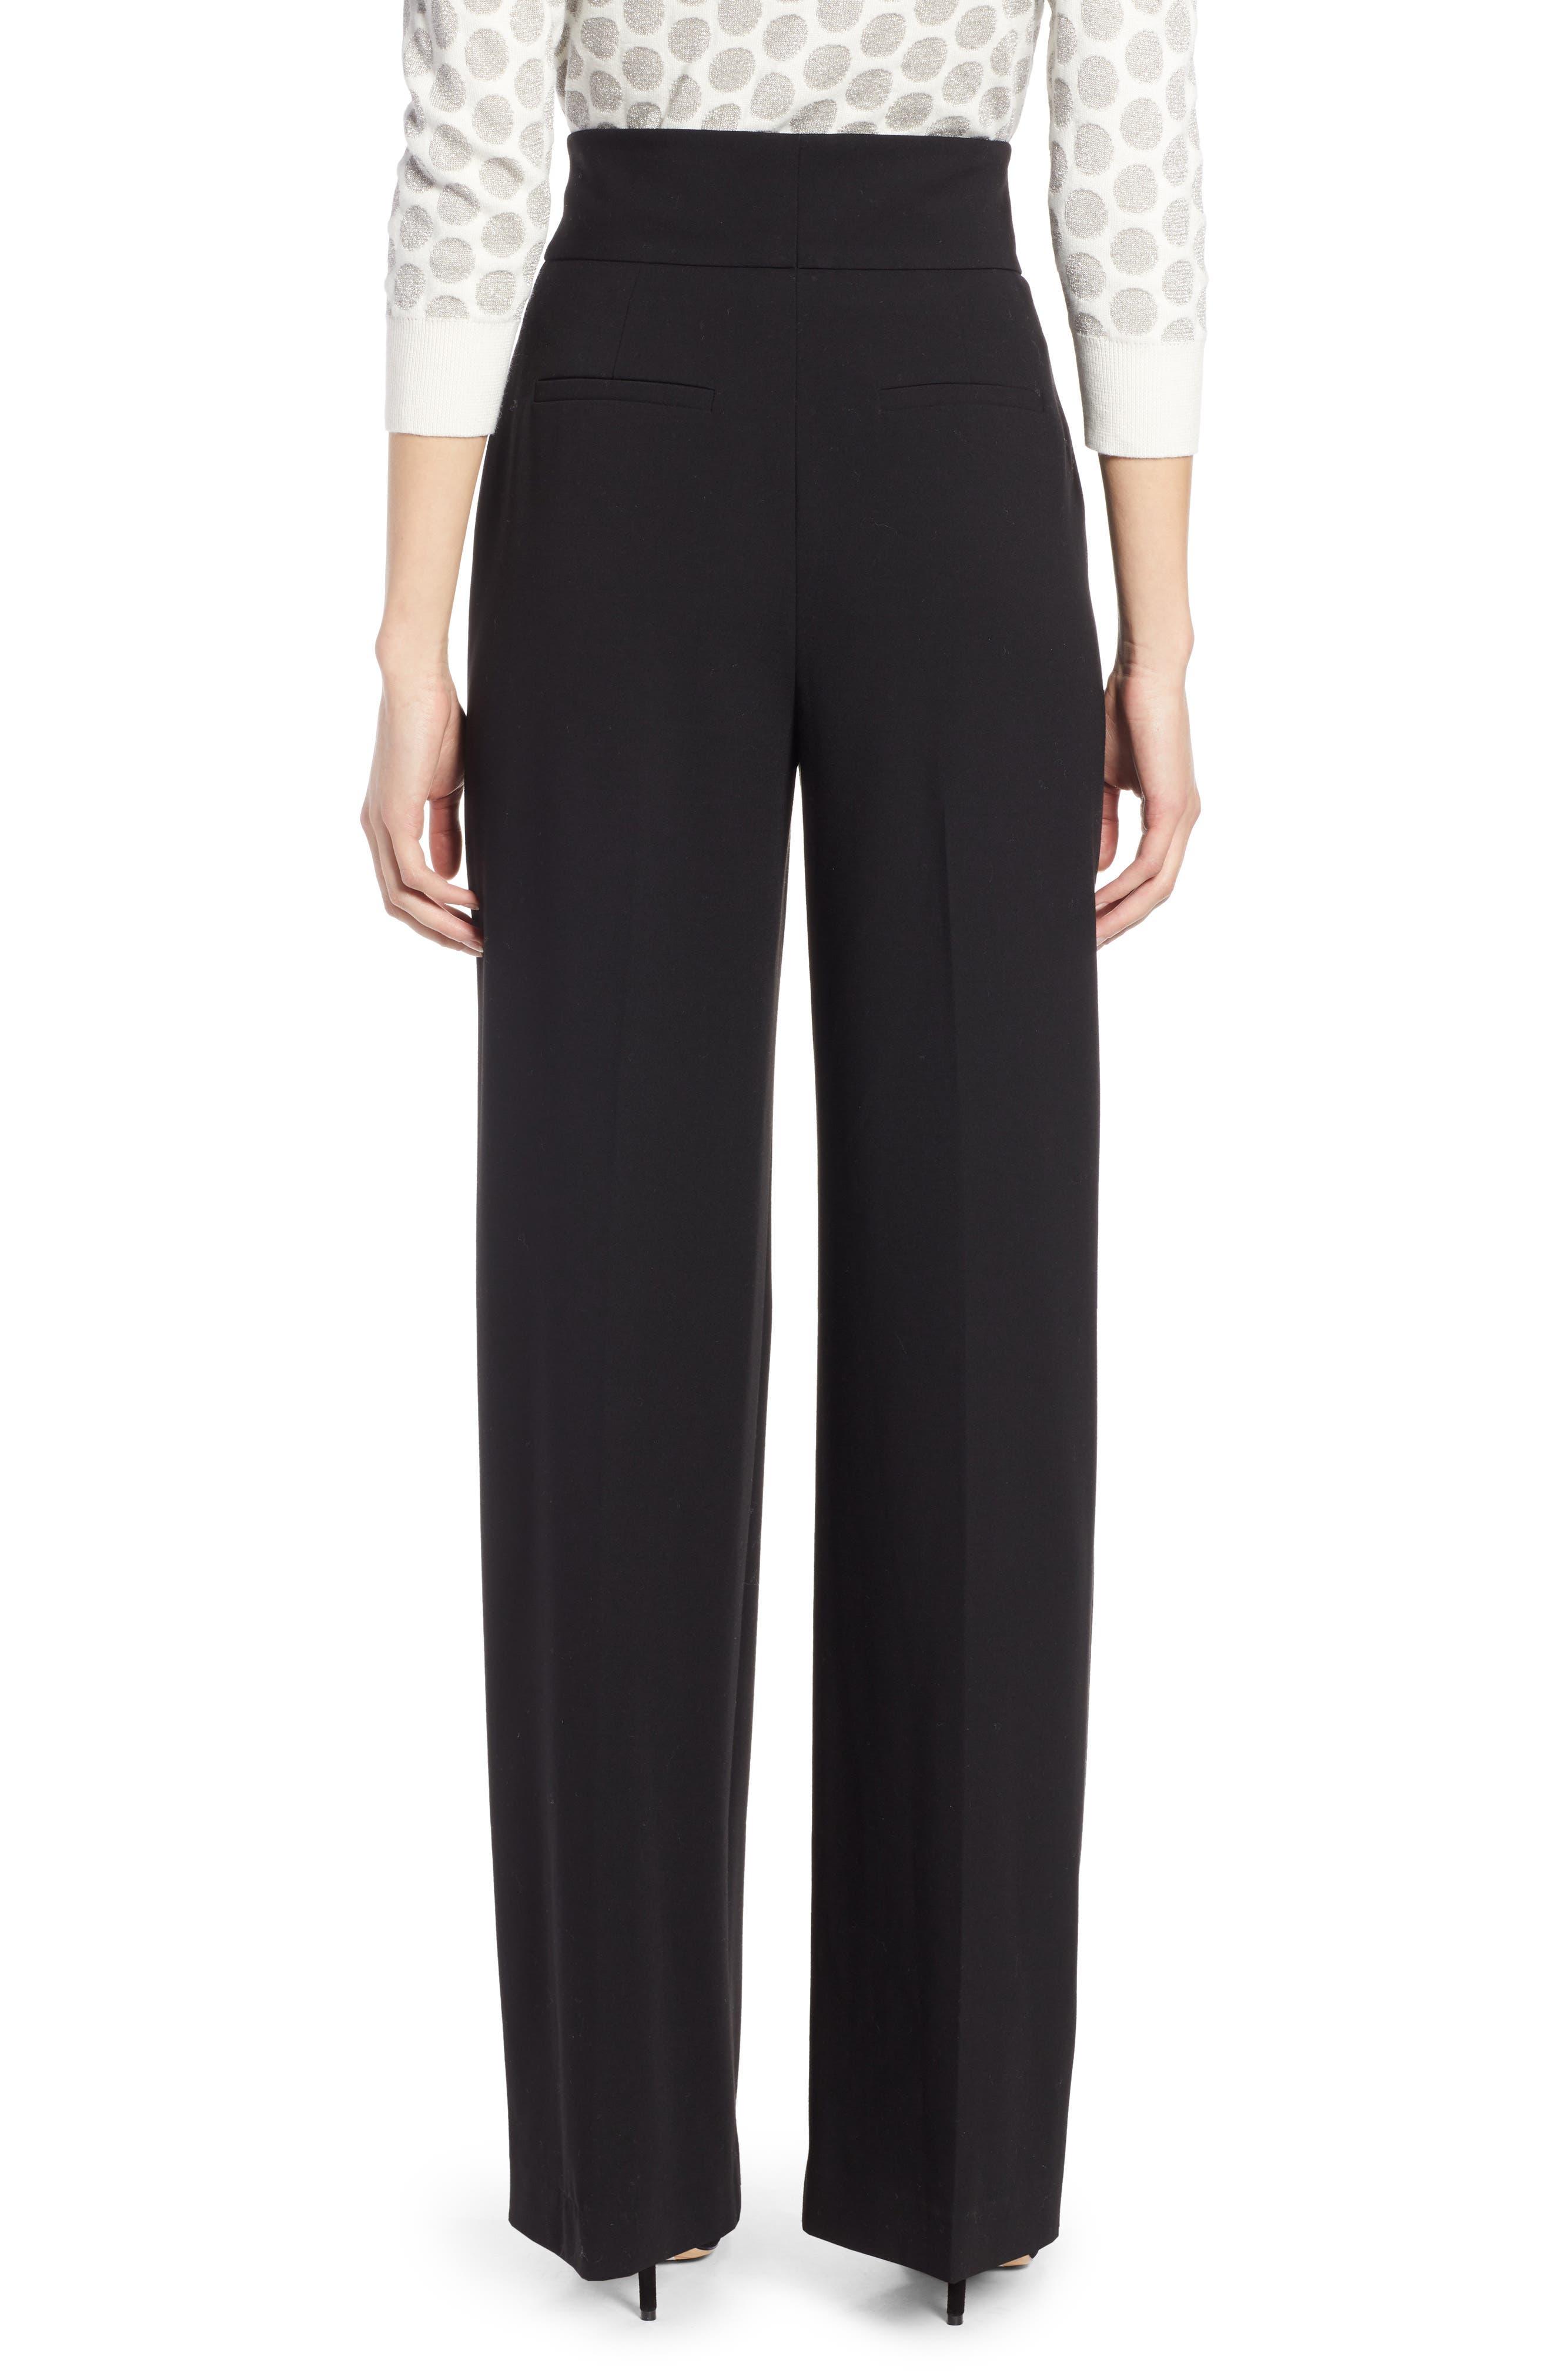 x Atlantic-Pacific High Waist Wide Leg Pants,                             Alternate thumbnail 3, color,                             BLACK